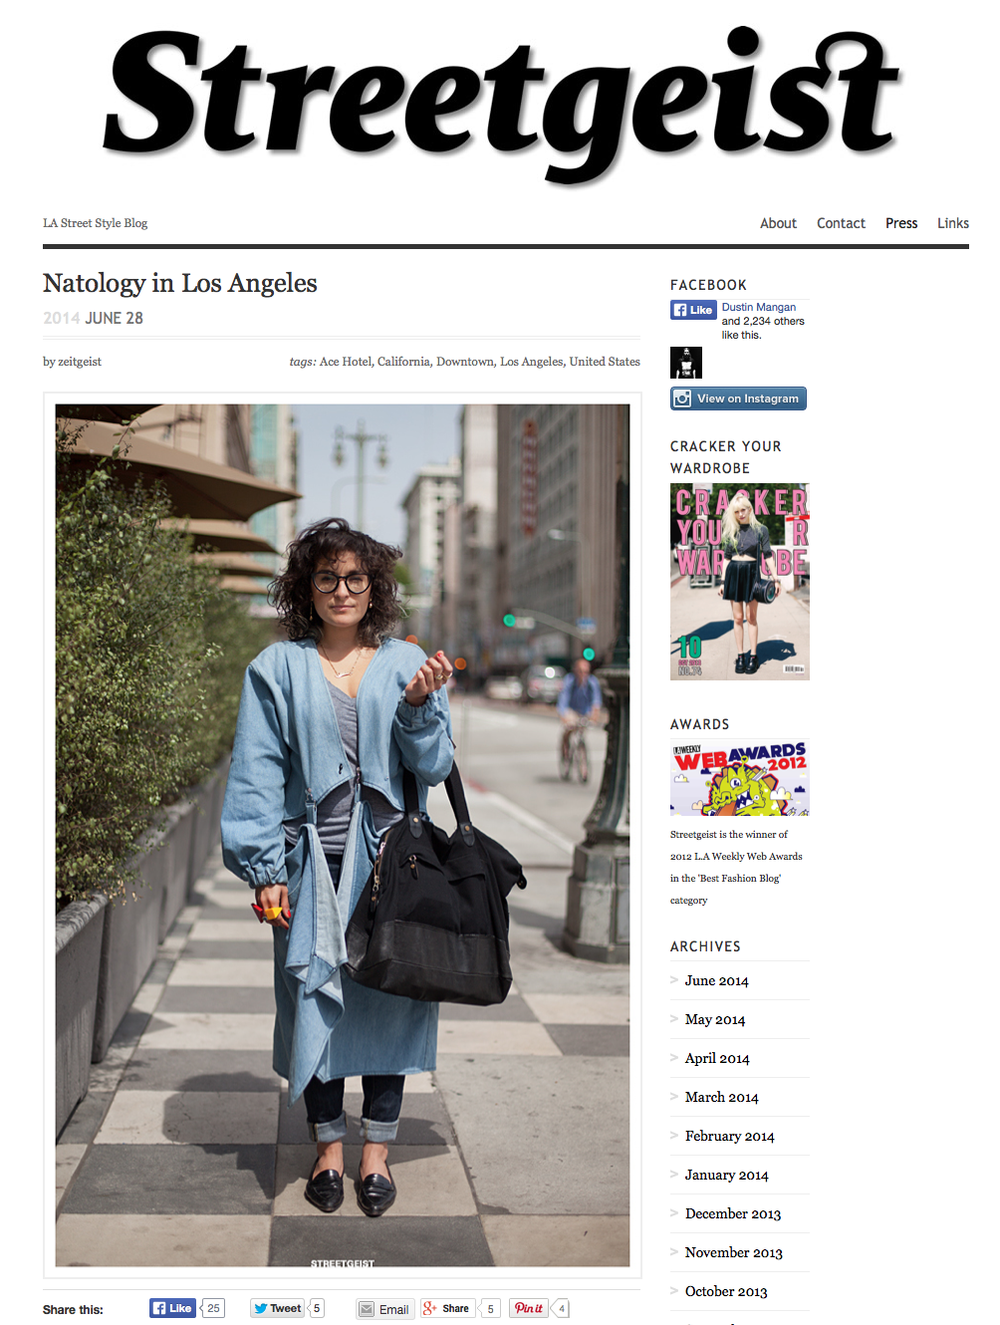 Natology_Streetgeist_NathalyCharria_Streetstyle_Fashion_Icon_muse_art_curator_roselagrua.png